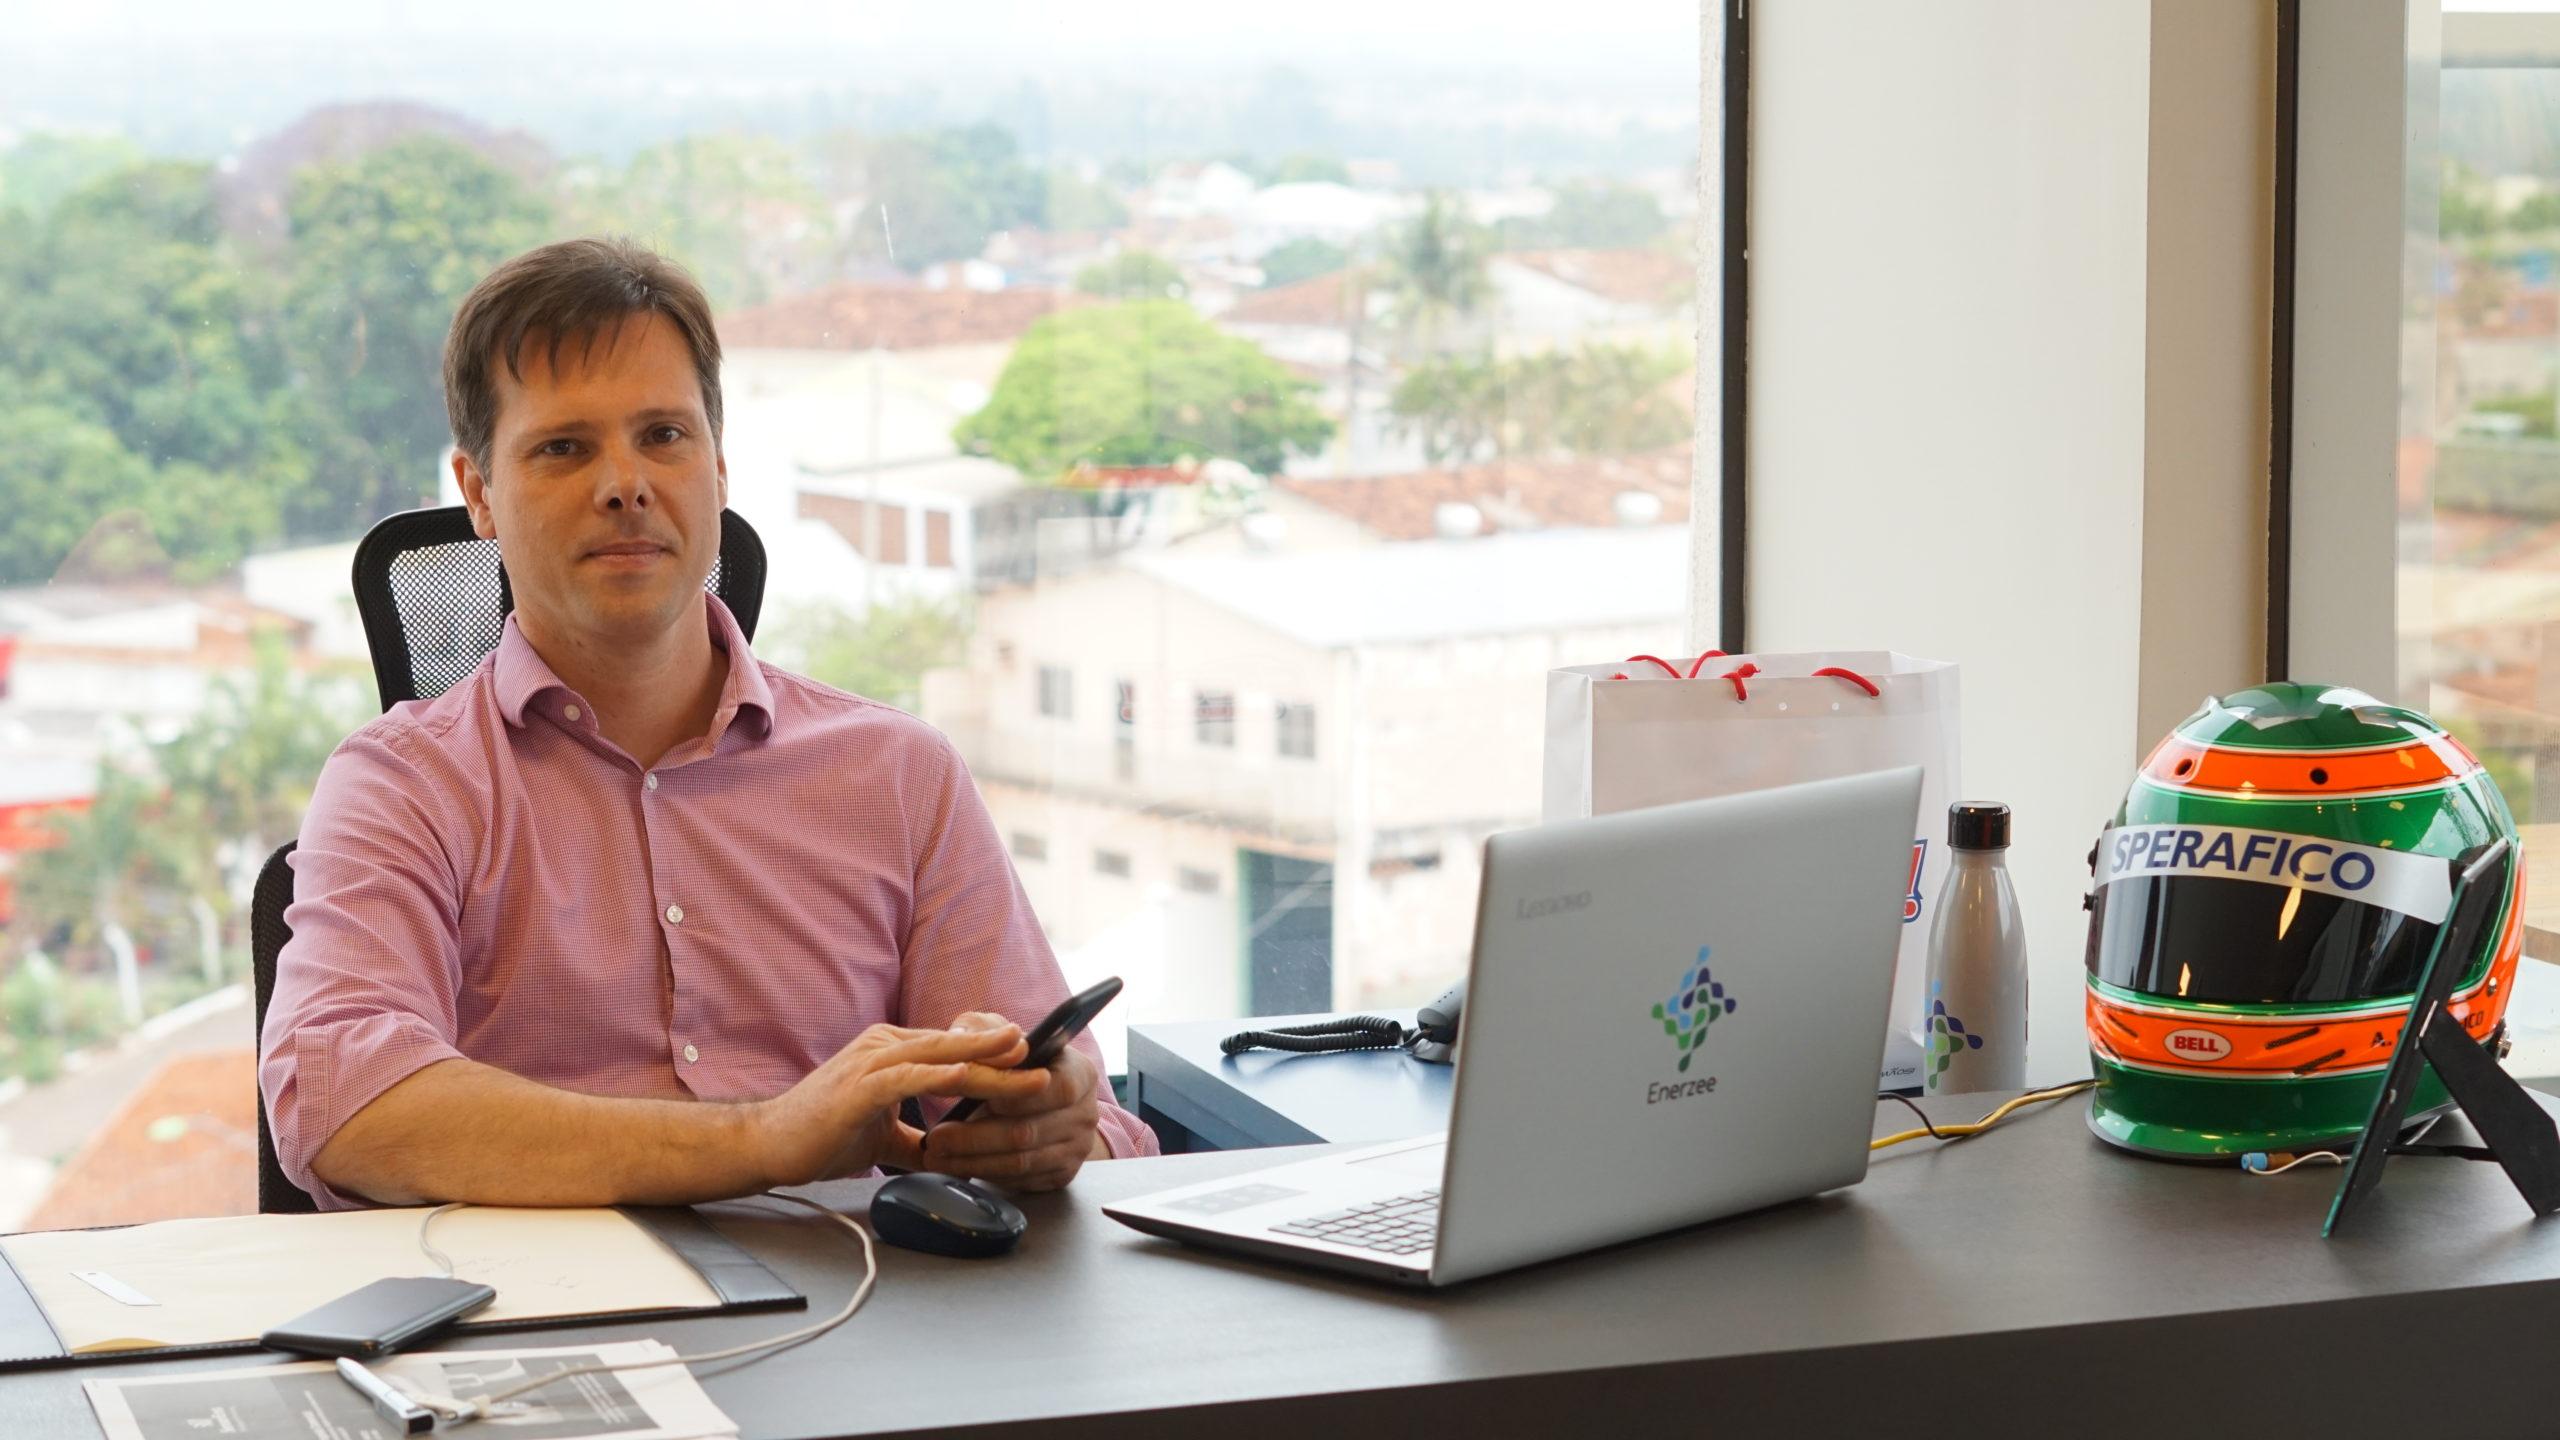 Alexandre Sperafico, CEO da Enerzee